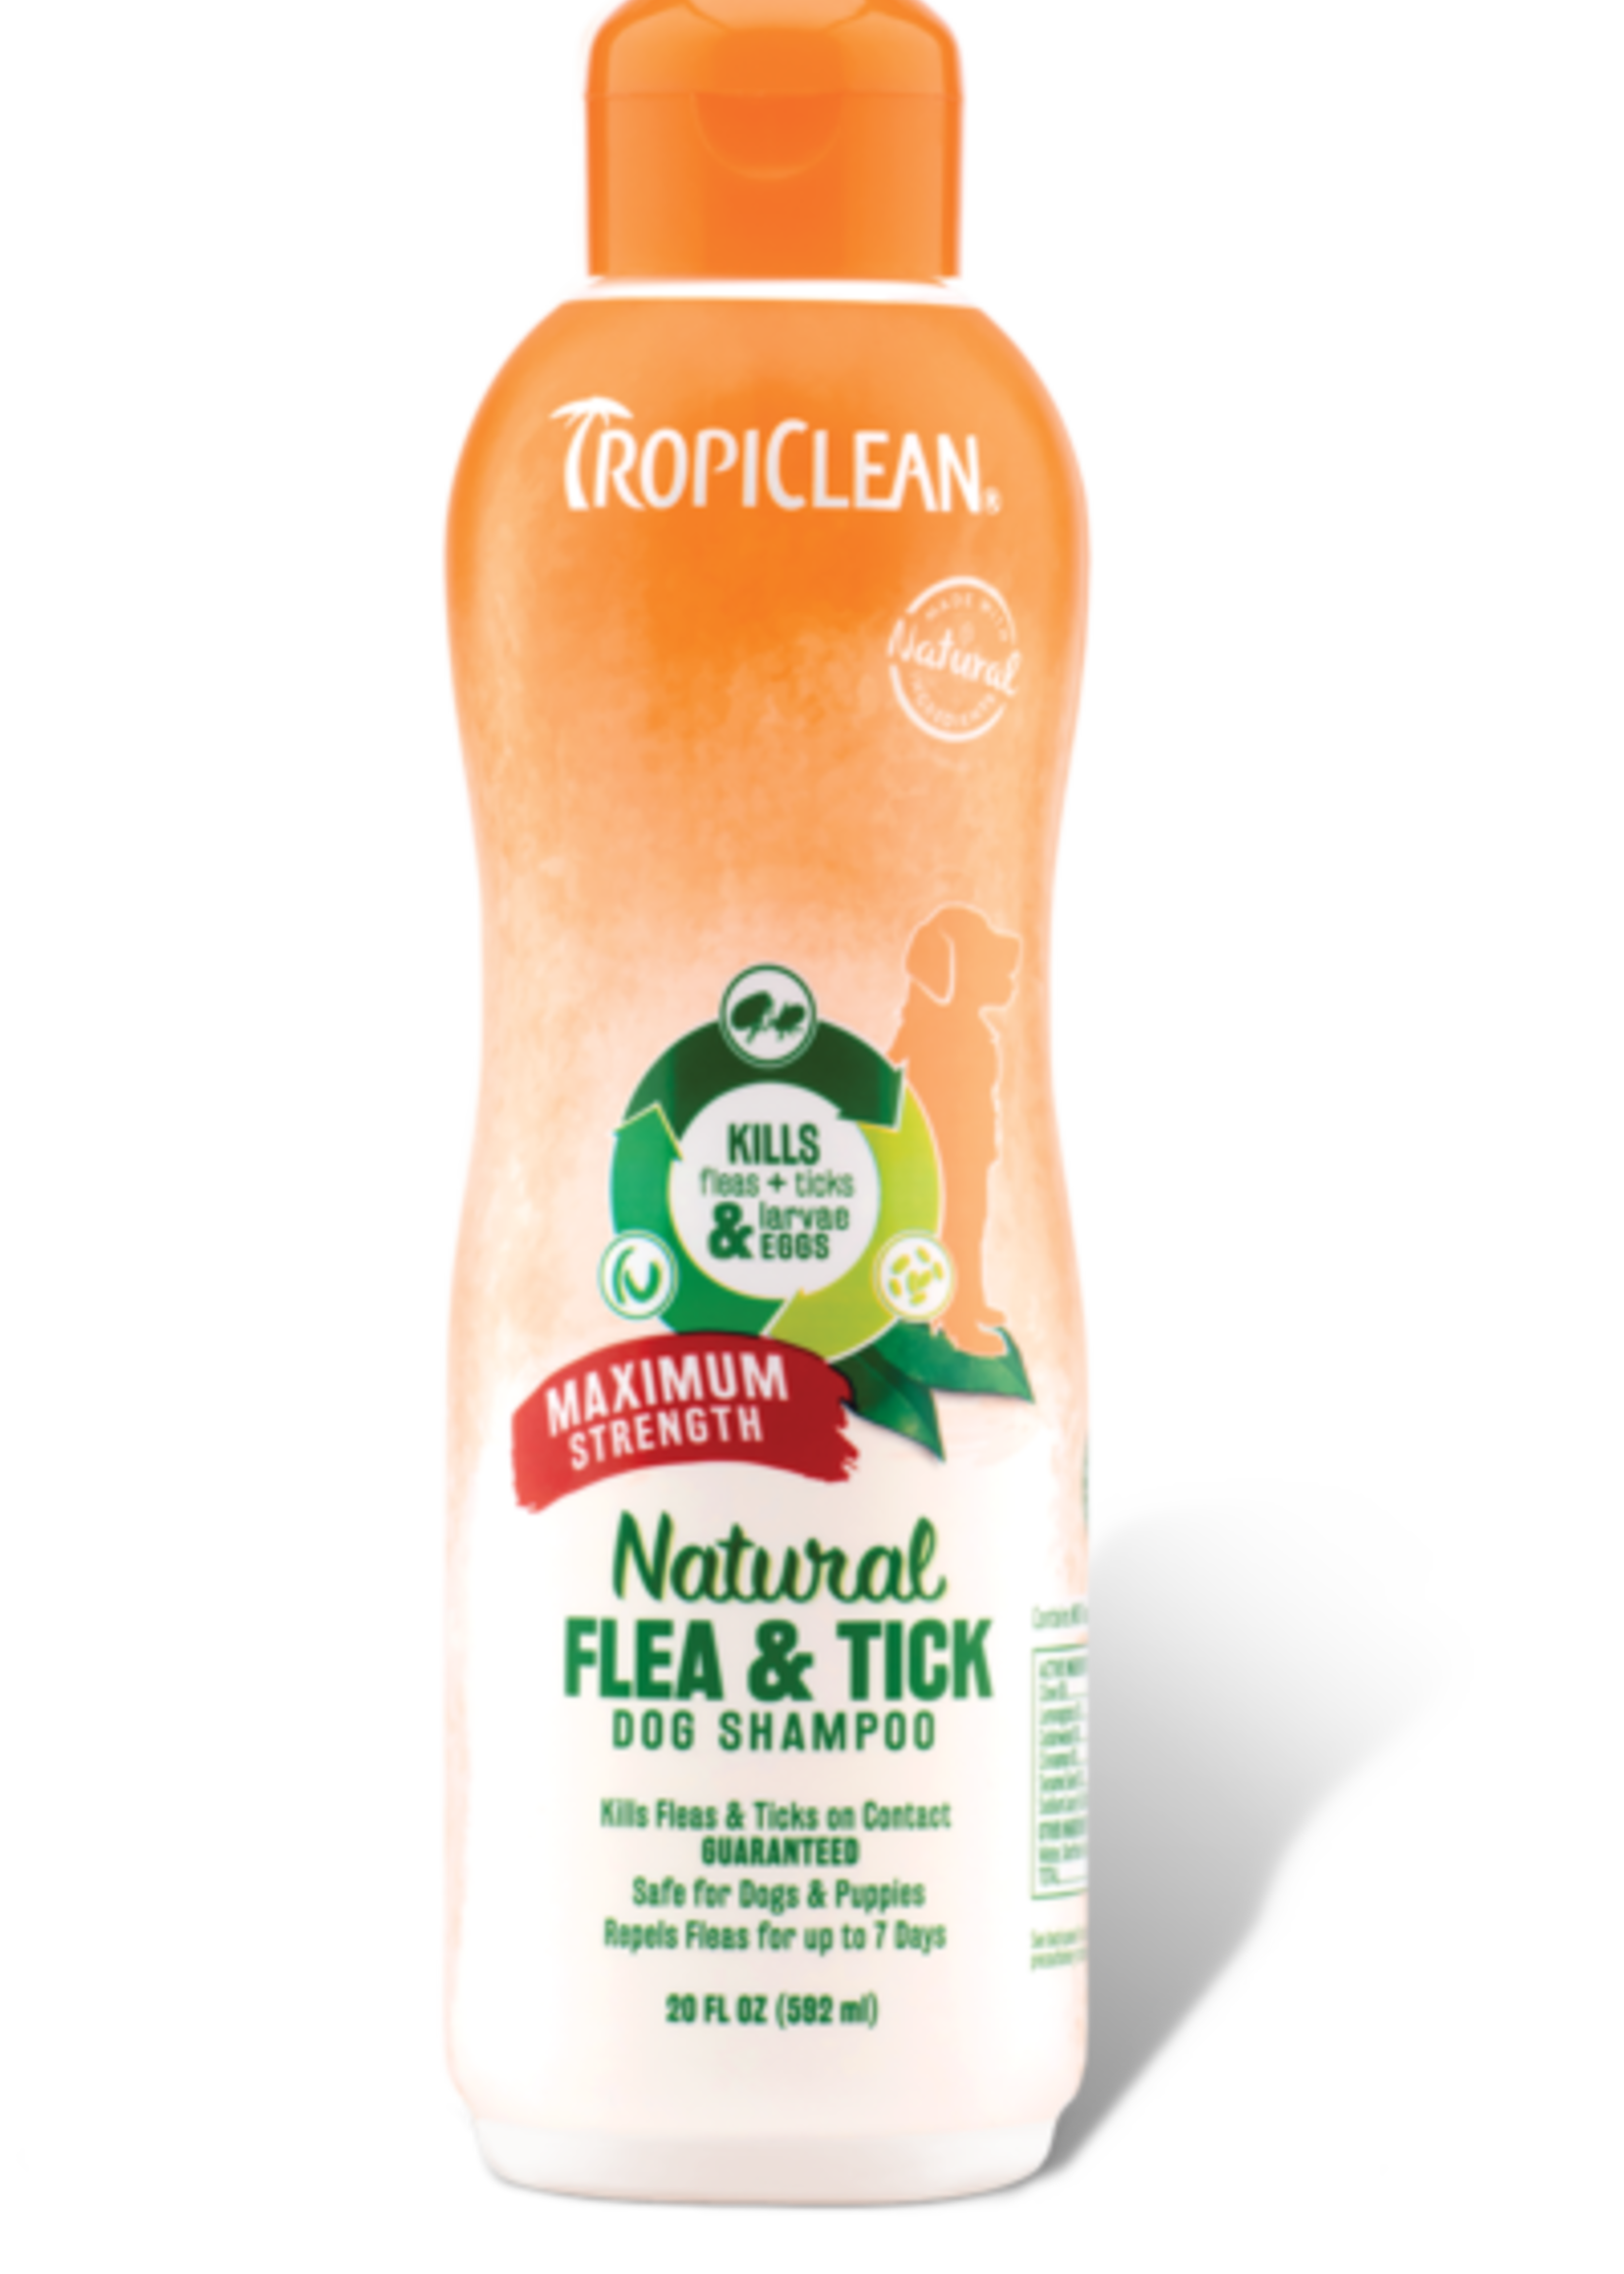 Tropiclean Manufacturing TropiClean Dog Flea and Tick Shampoo + Maximum Strength 20 oz